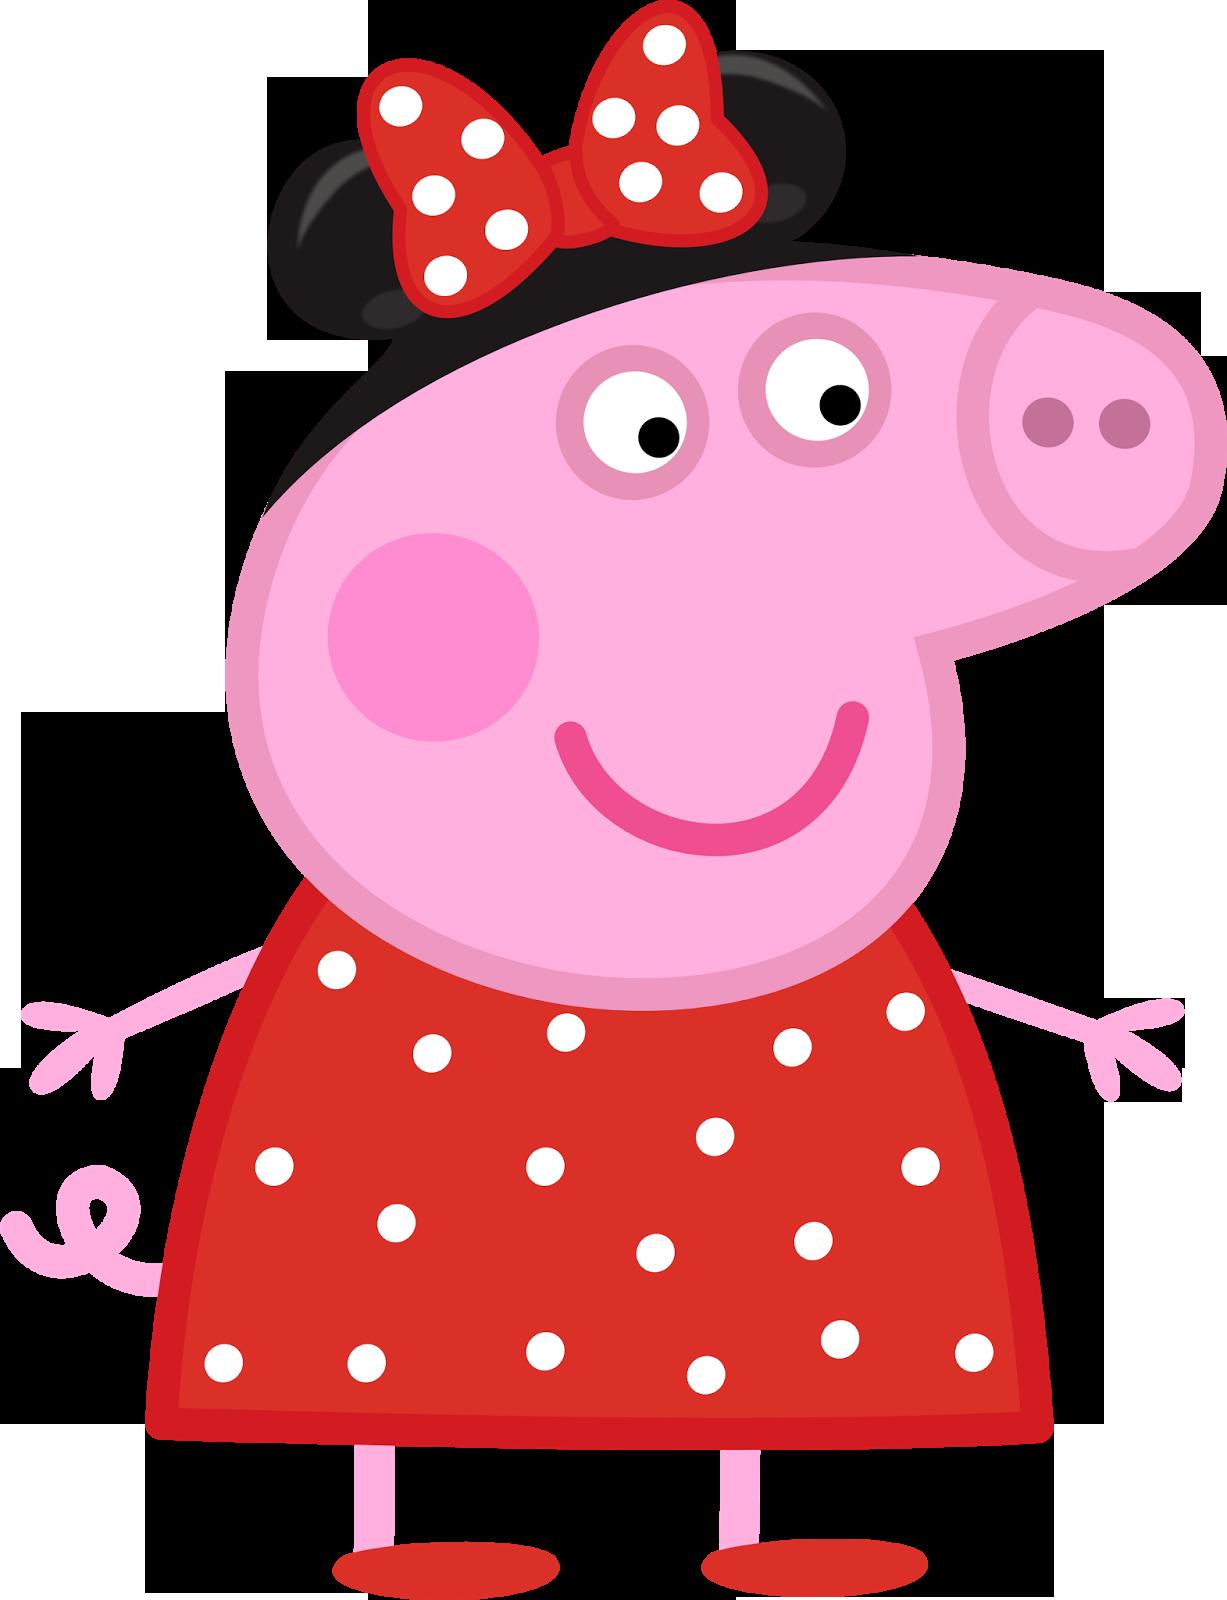 Картинки надписями, свинка пеппа картинки для детей